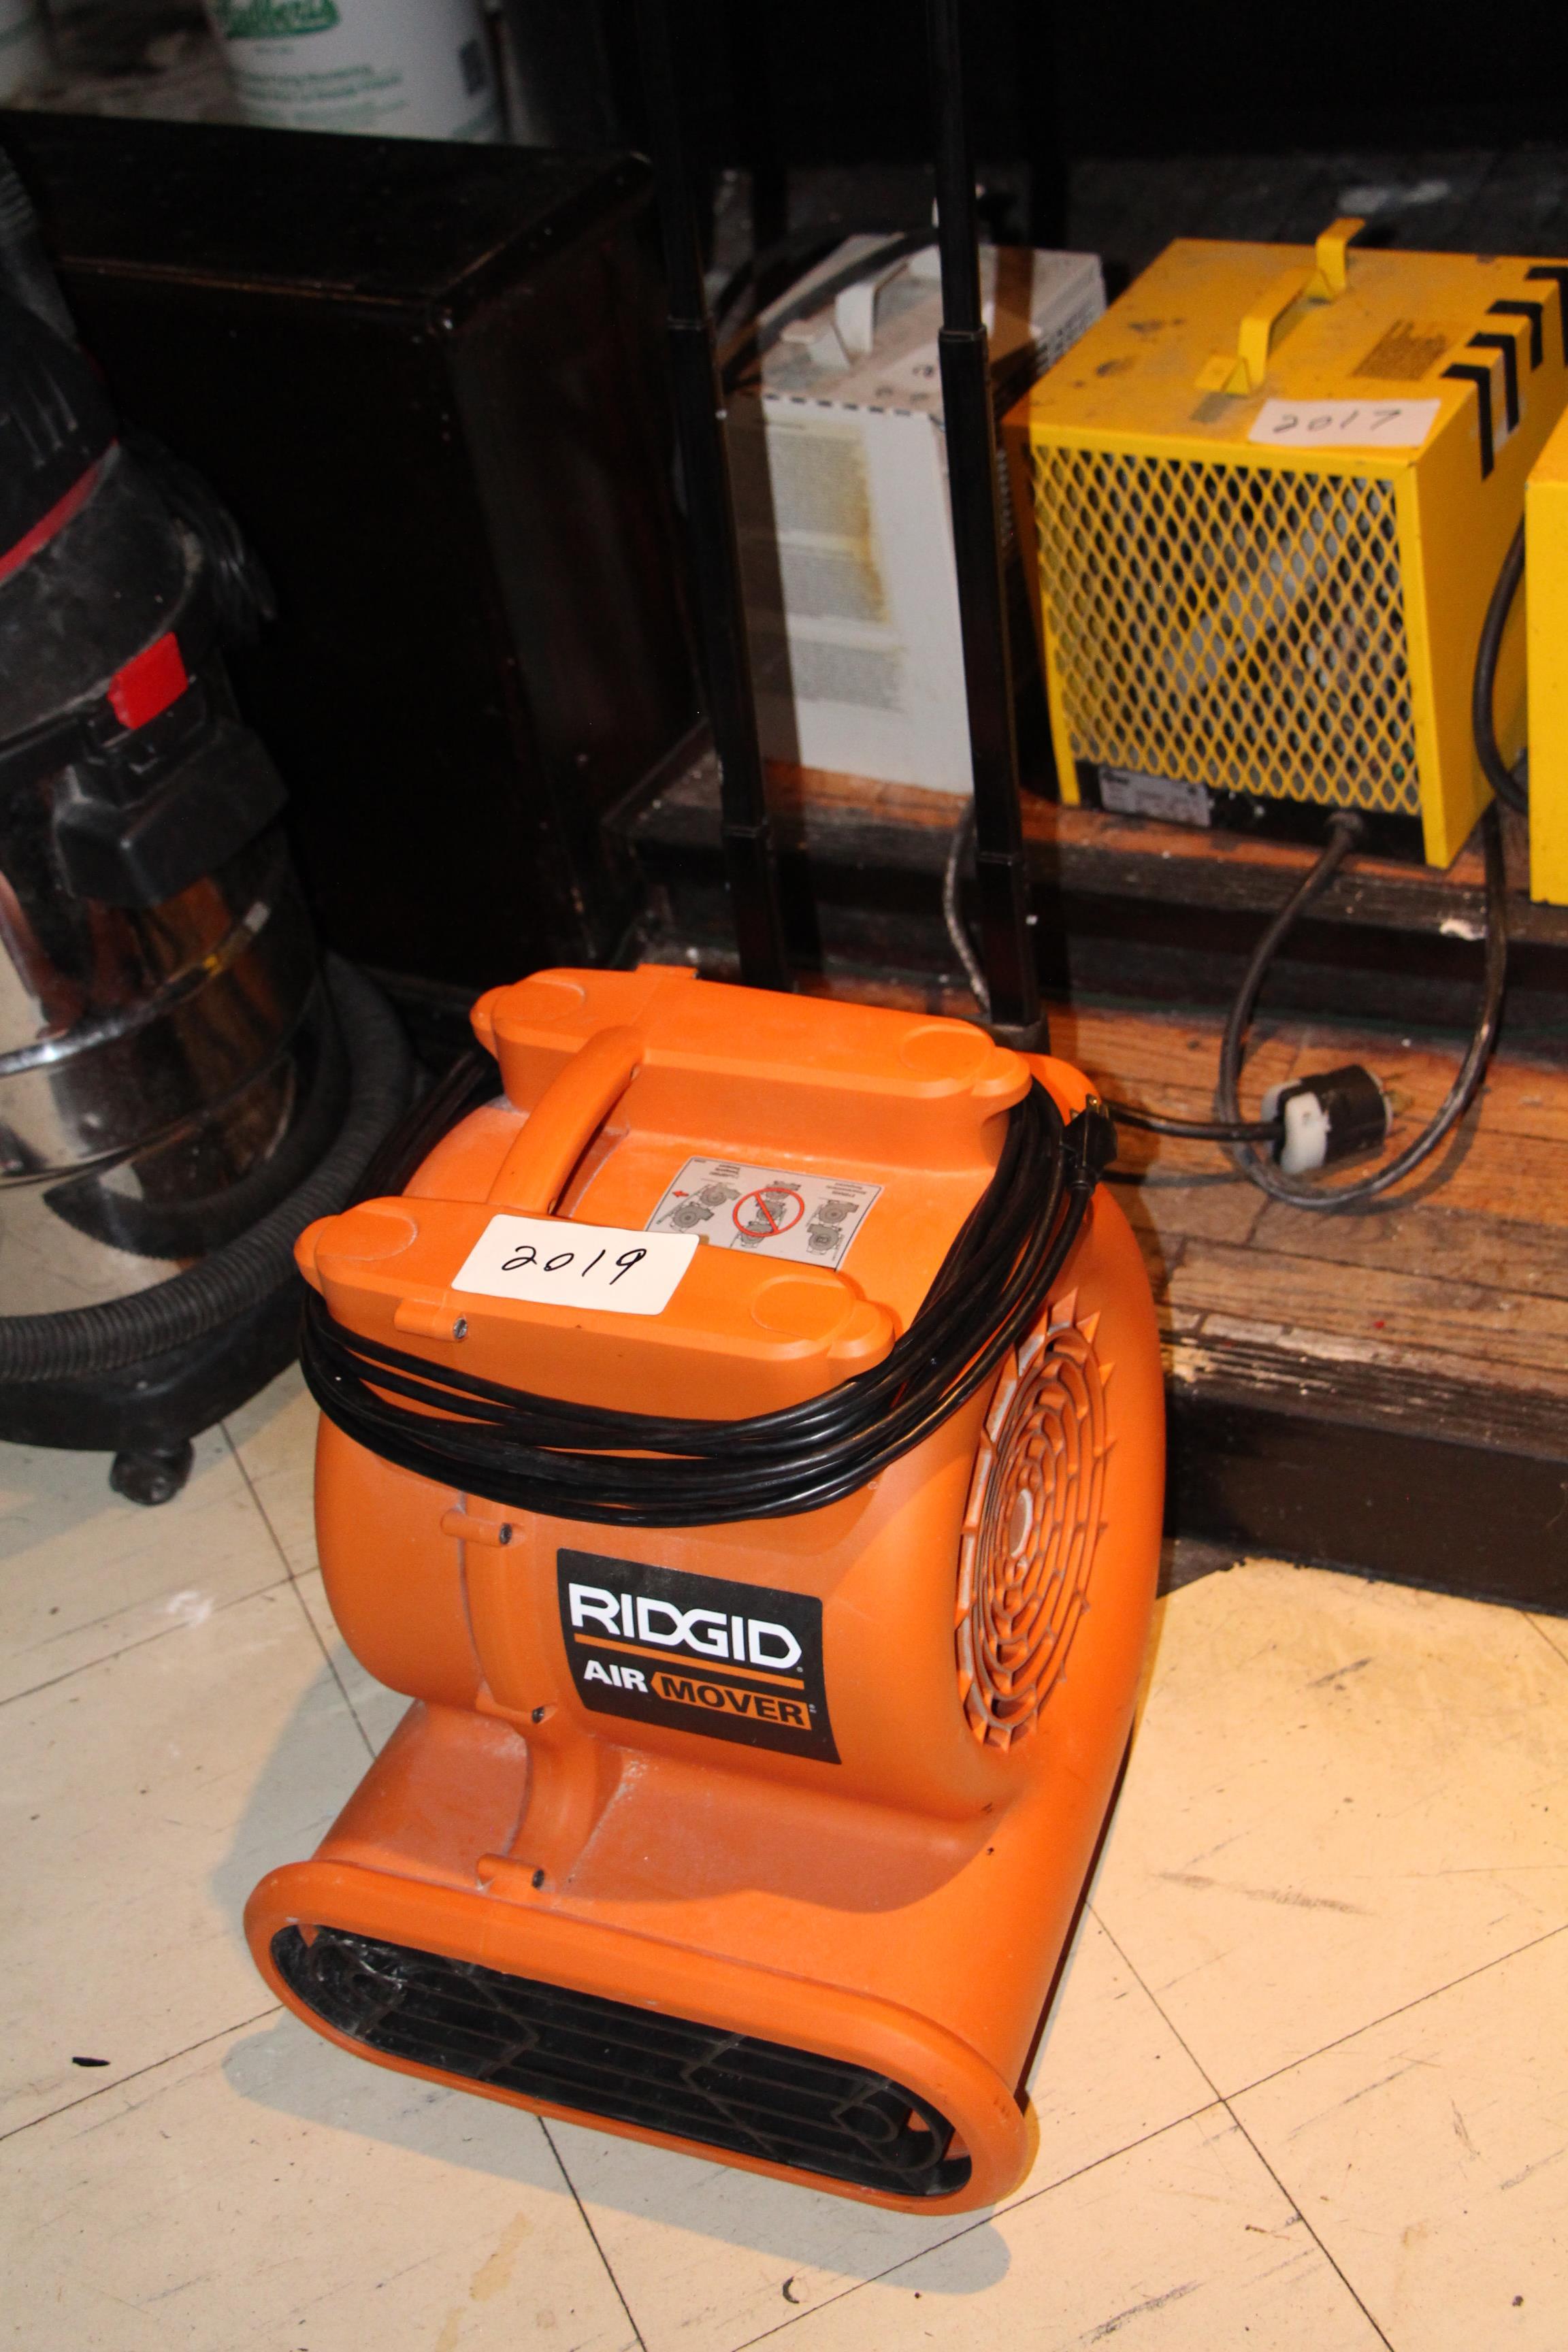 Lot 2019 - Ridgid electric air mover